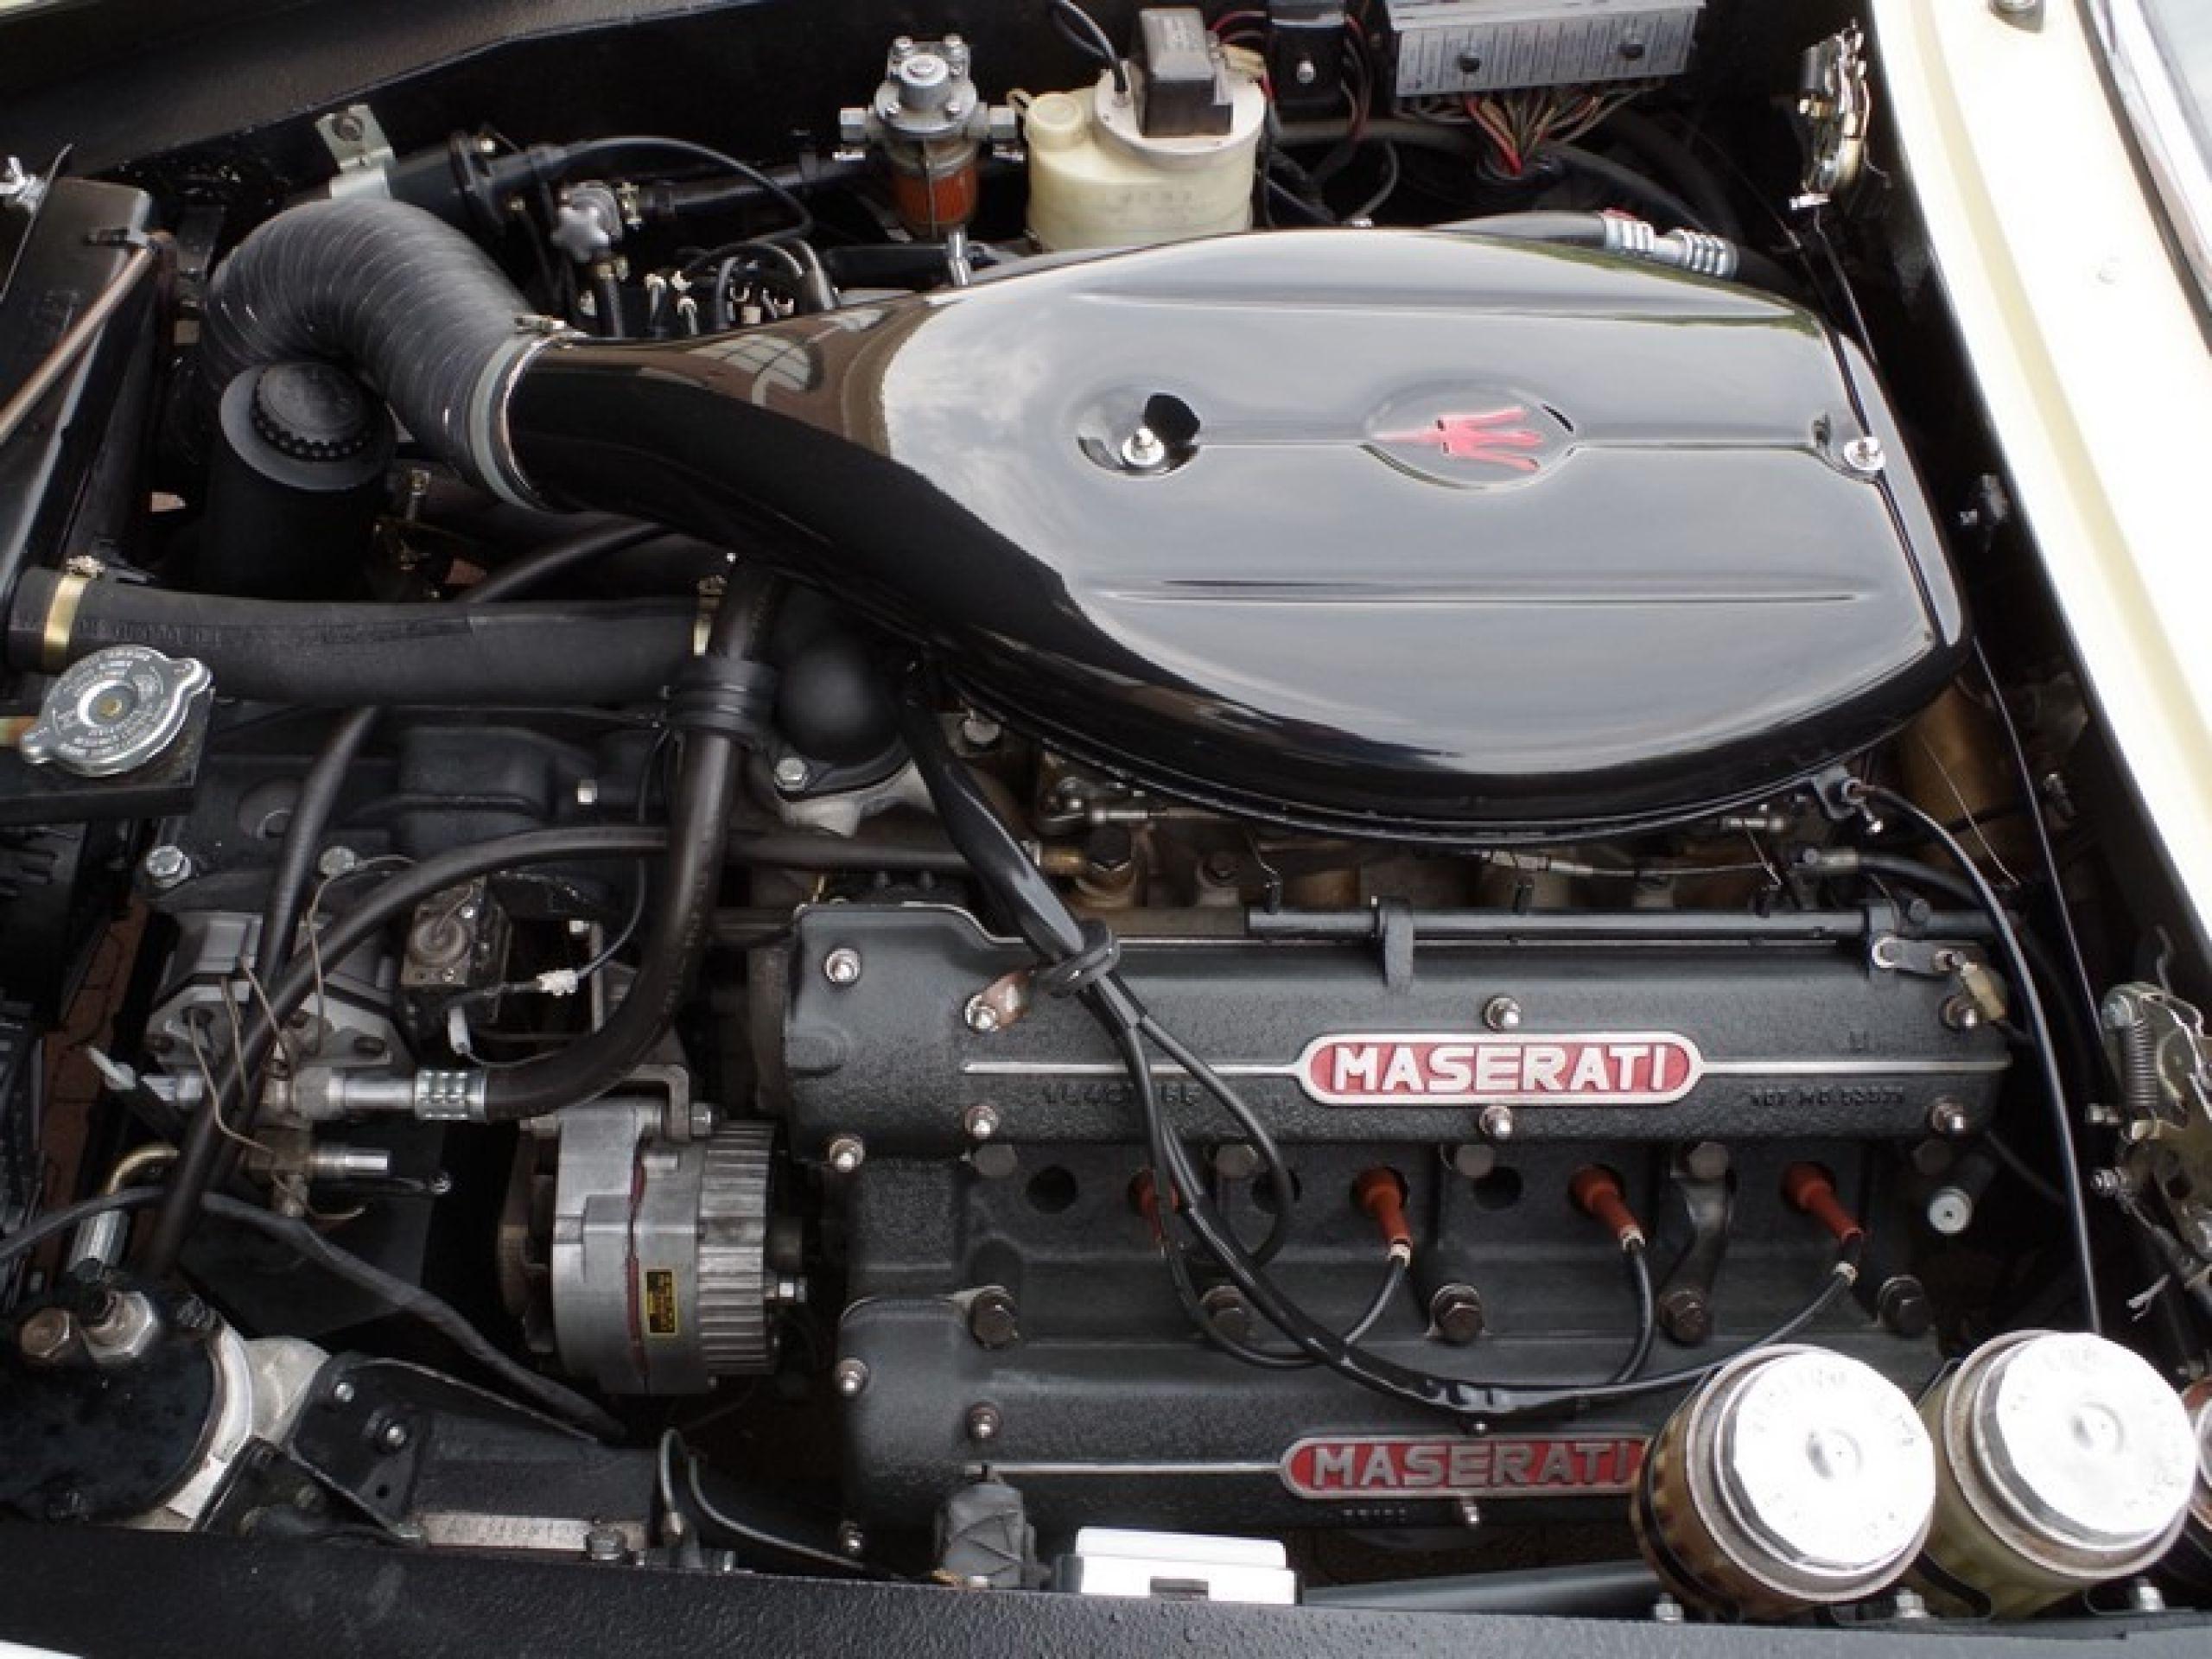 Maserati Ghibli 4.7 (1967)